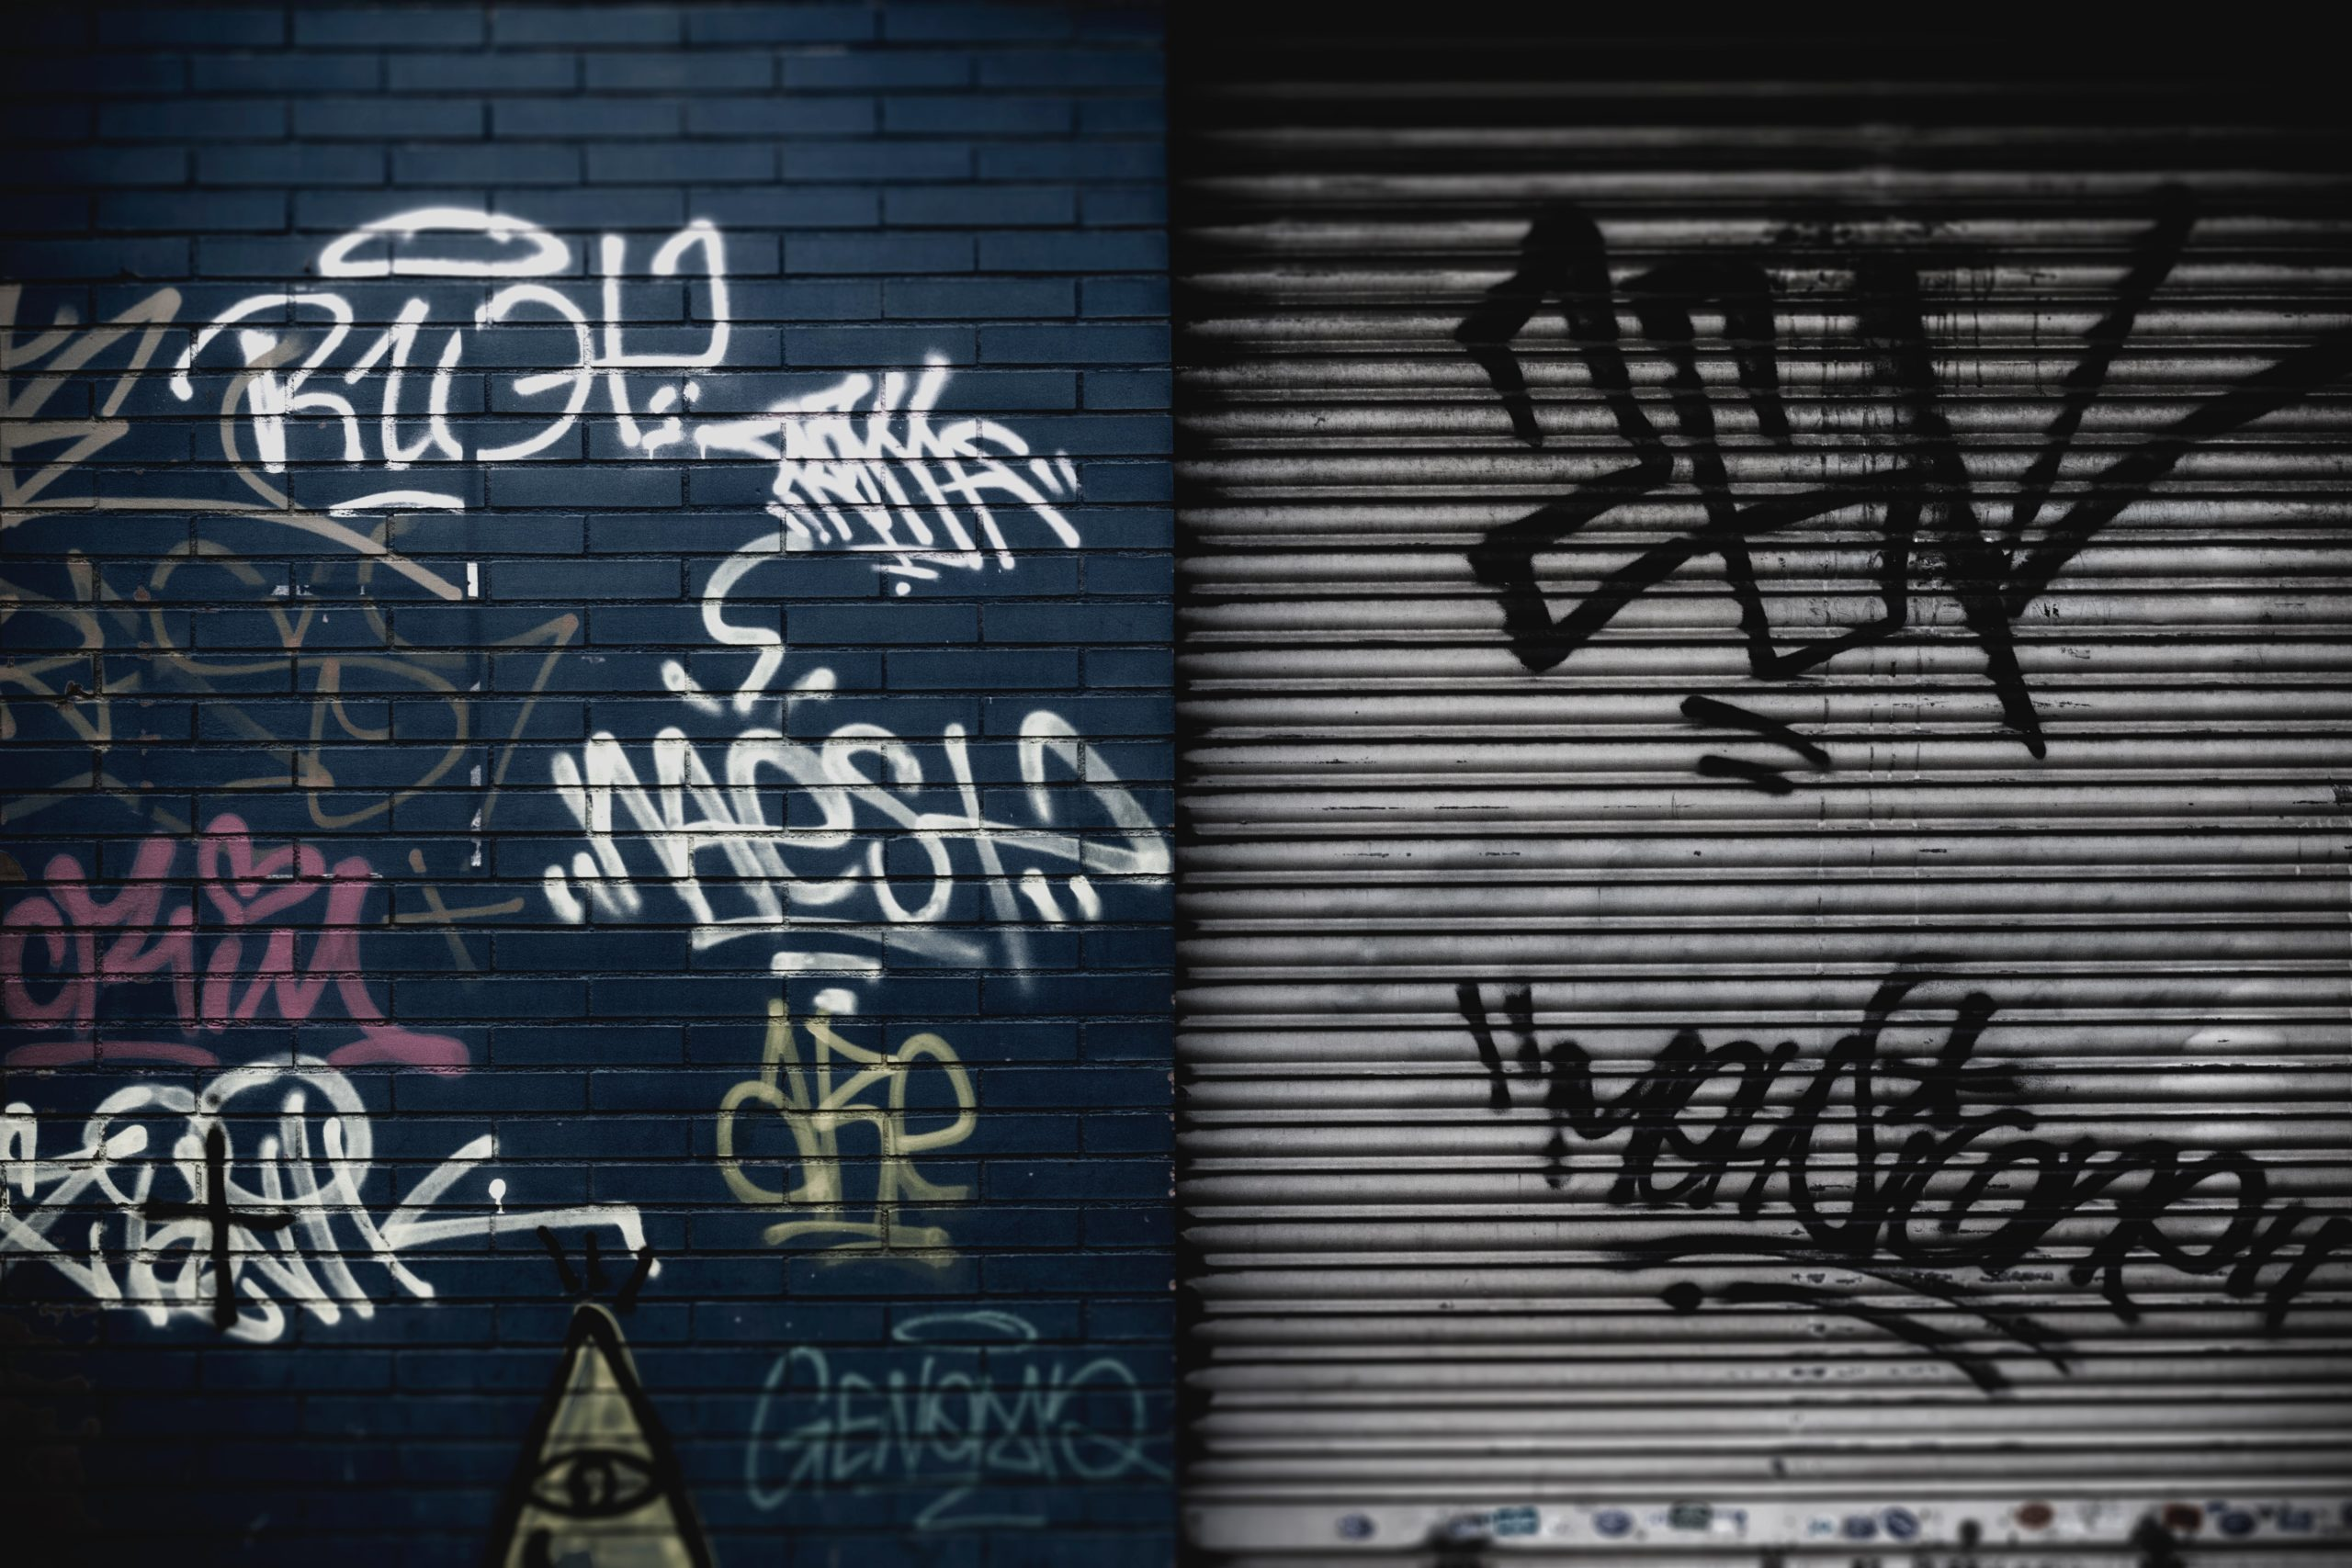 graffiti removal Phoenix